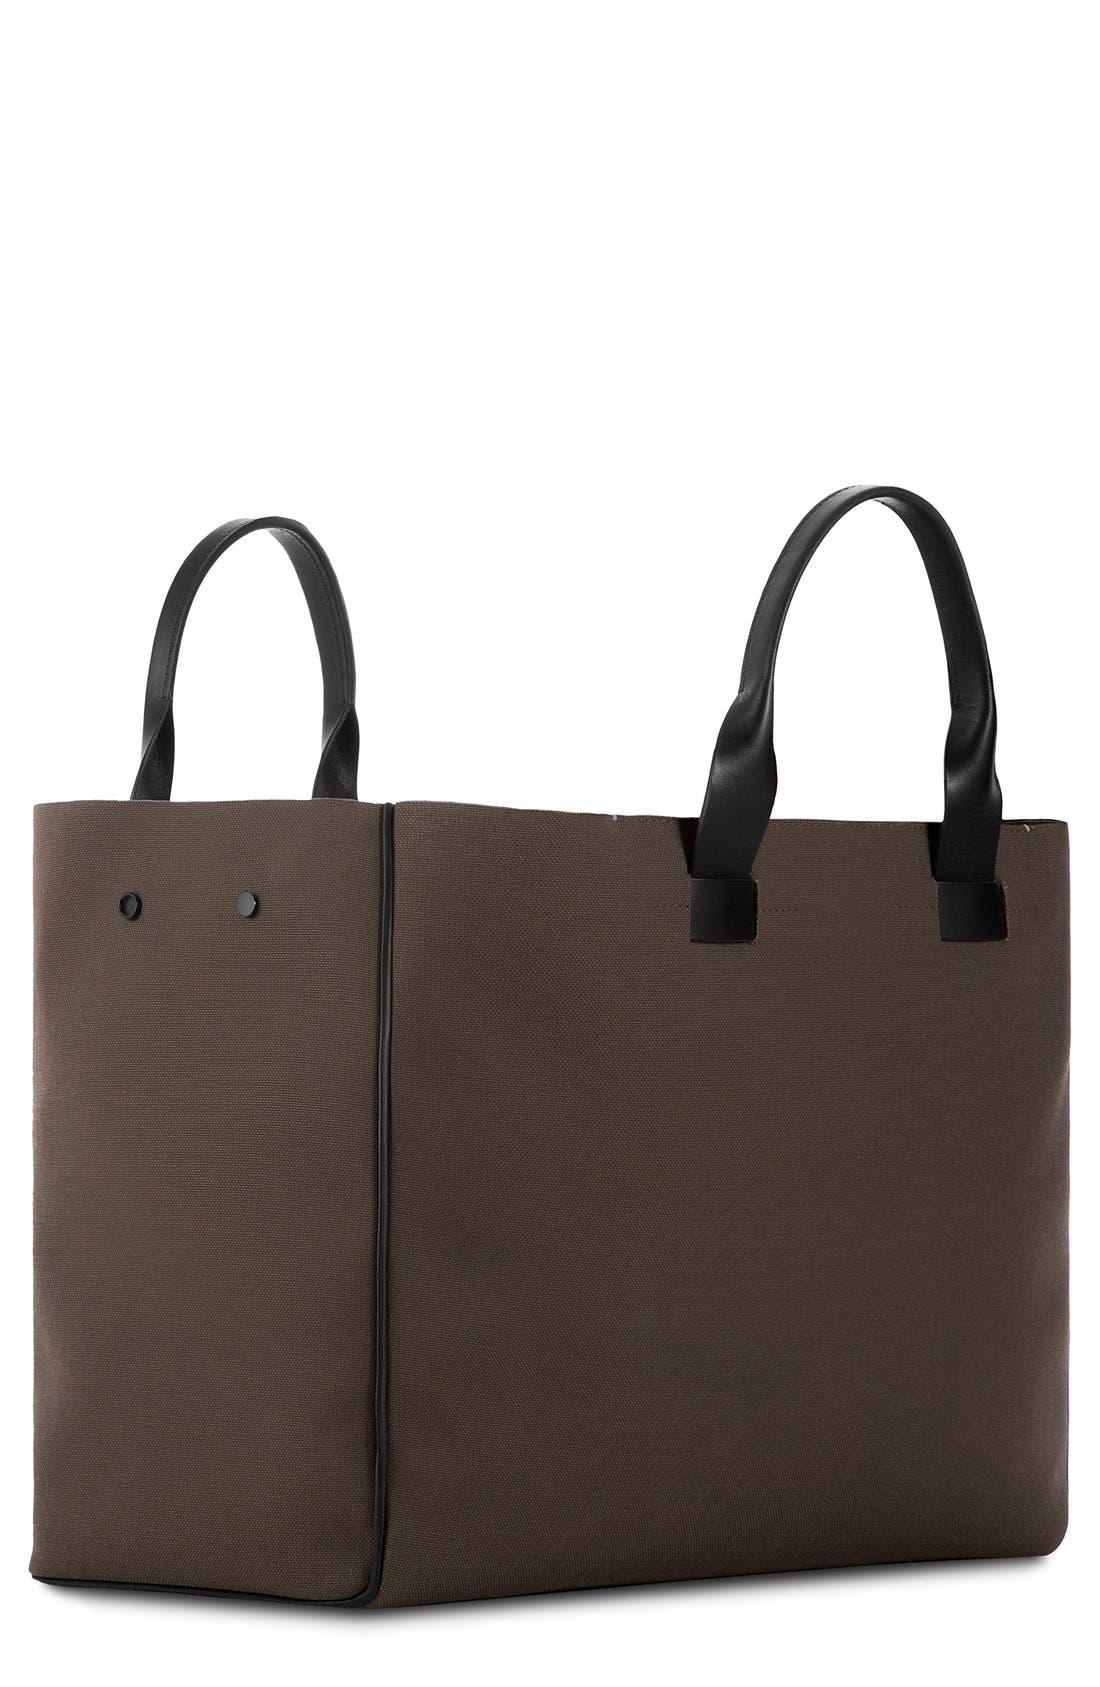 Troubadour Nylon & Leather Tote Bag